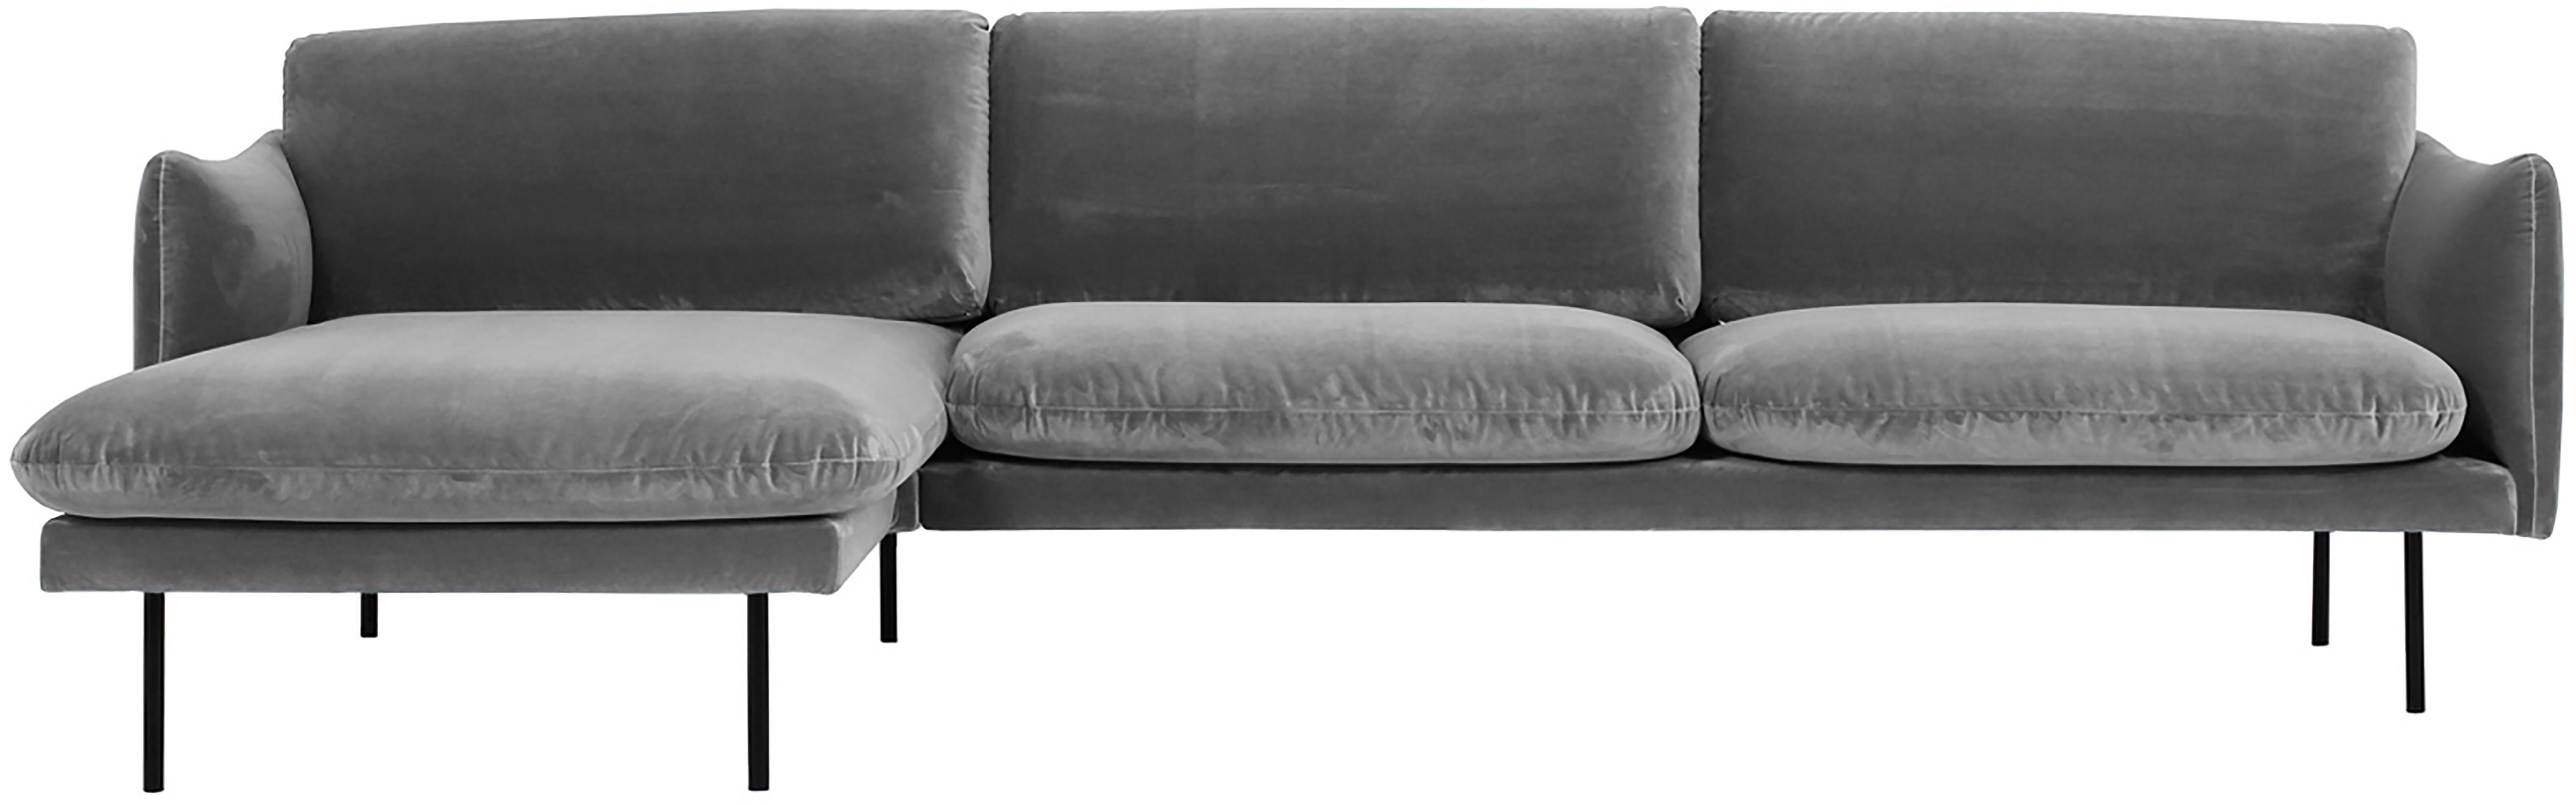 Samt-Ecksofa Moby, Bezug: Samt (Hochwertiger Polyes, Gestell: Massives Kiefernholz, Samt Grau, B 280 x T 160 cm